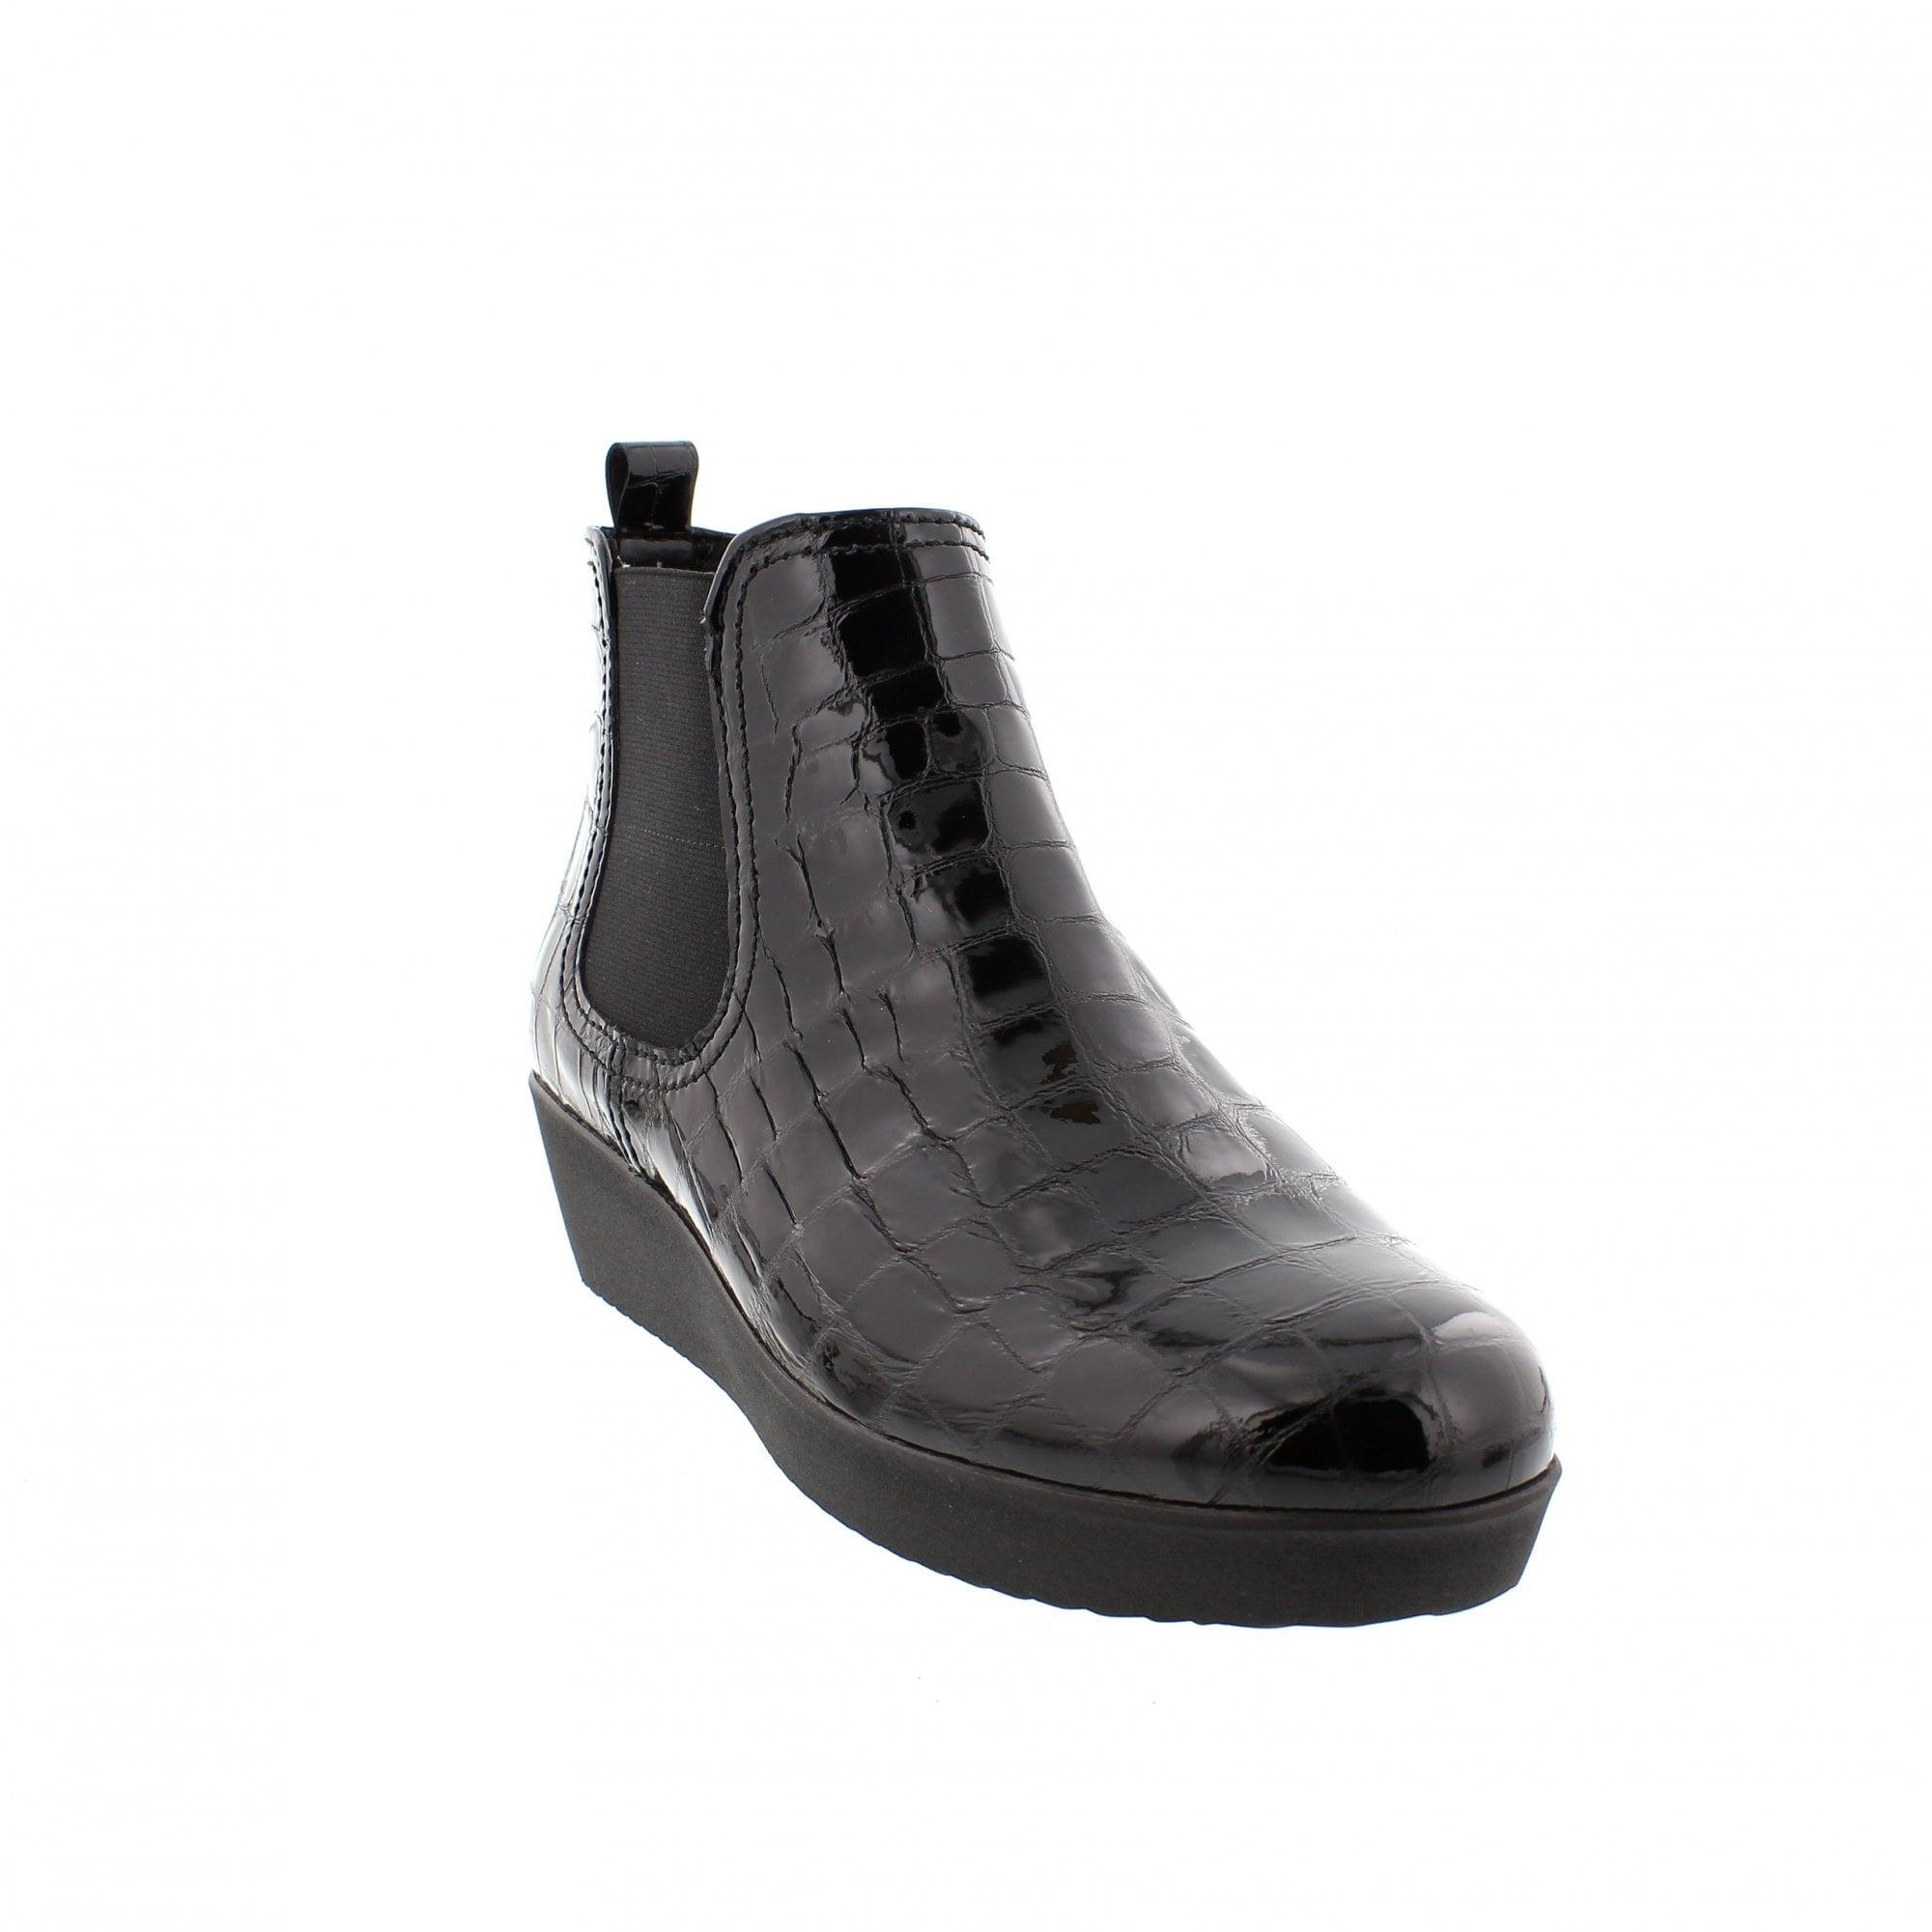 Gabor Ghost 96-050-97 Black Patent Croc